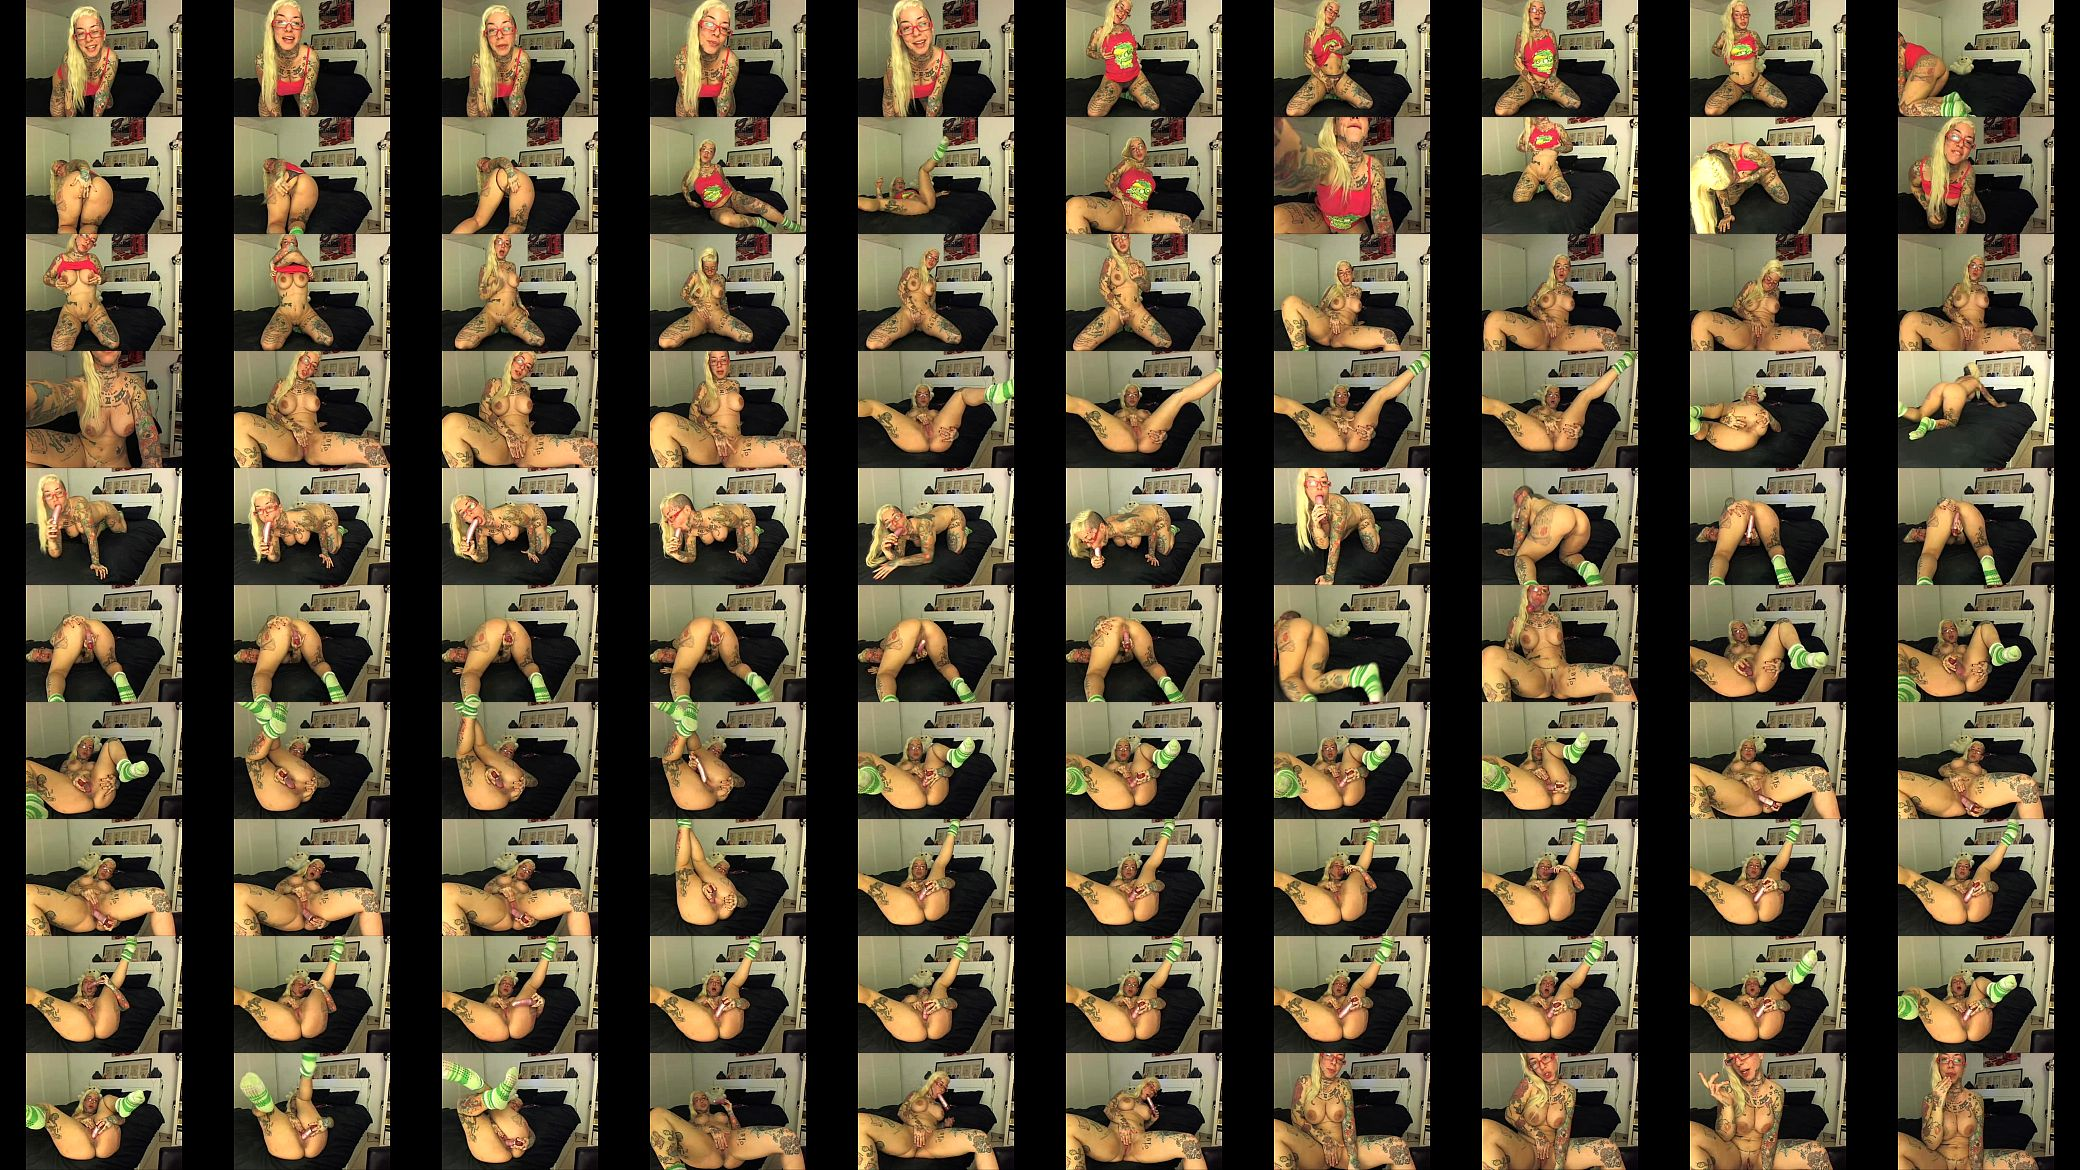 Mykiwis Porno Show video marturbandome para mis fans de mykiwis - xvideos